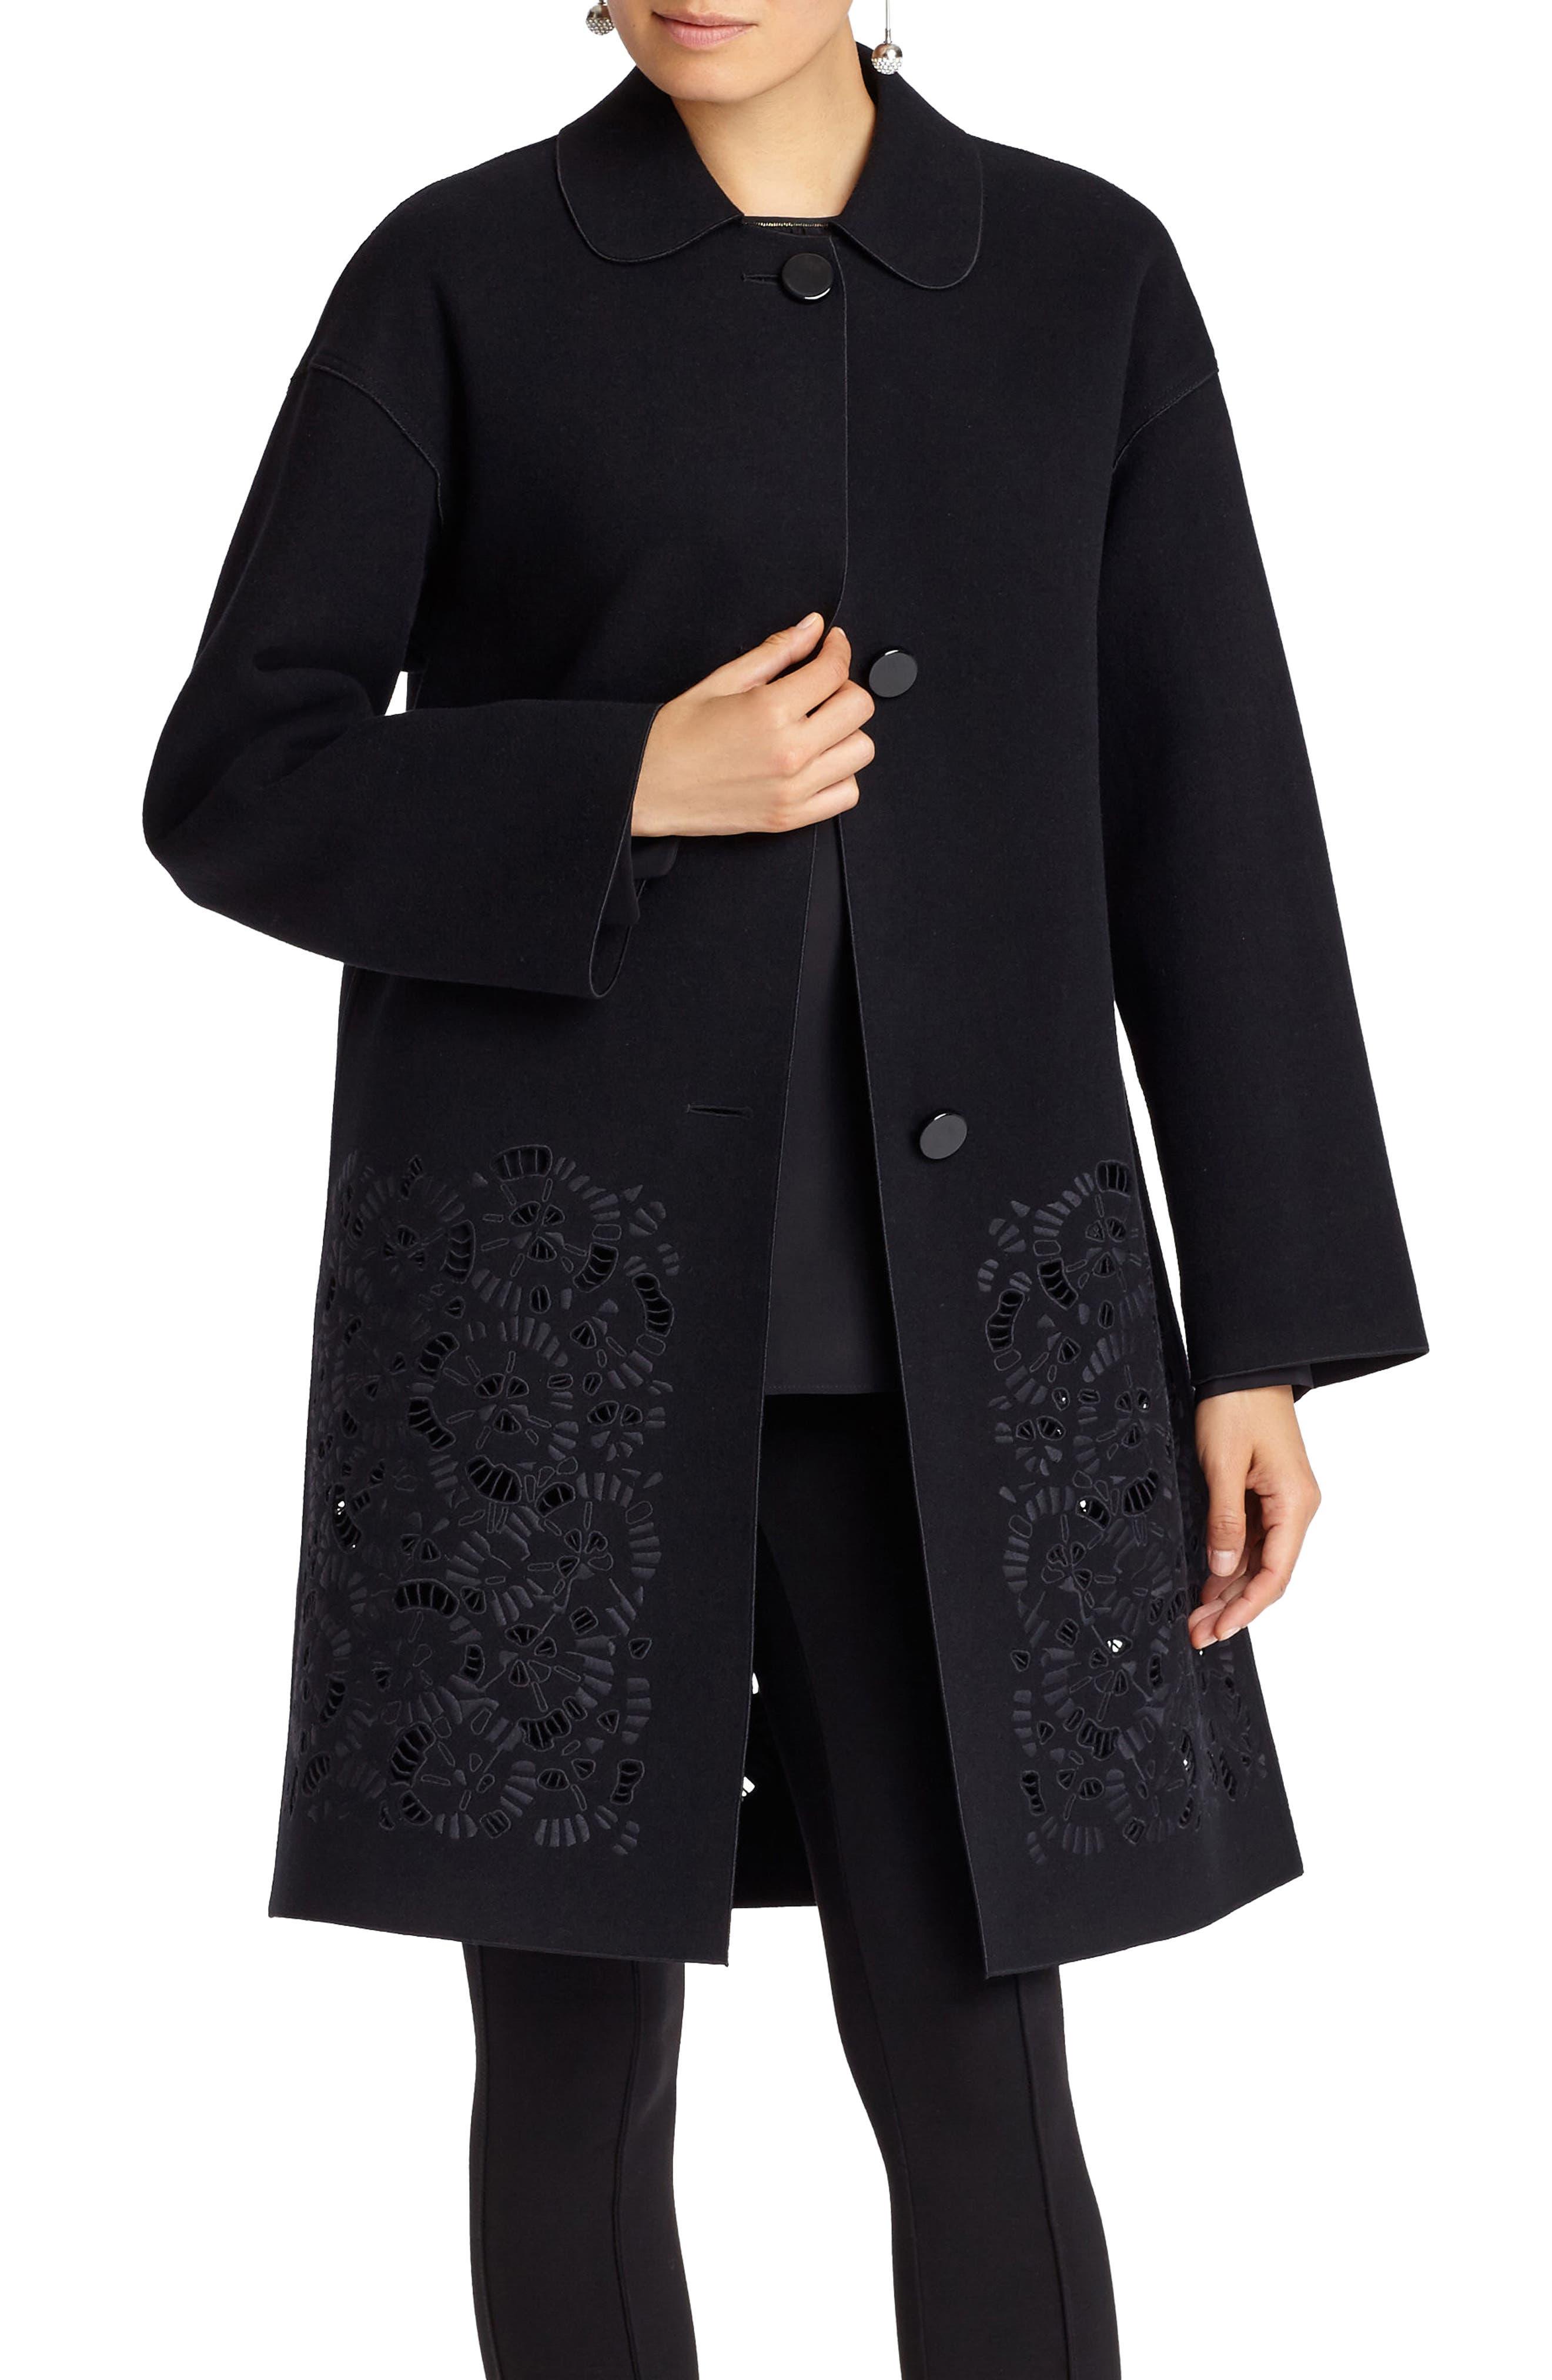 Vita Laser Cut Embroidered Coat,                         Main,                         color, Black